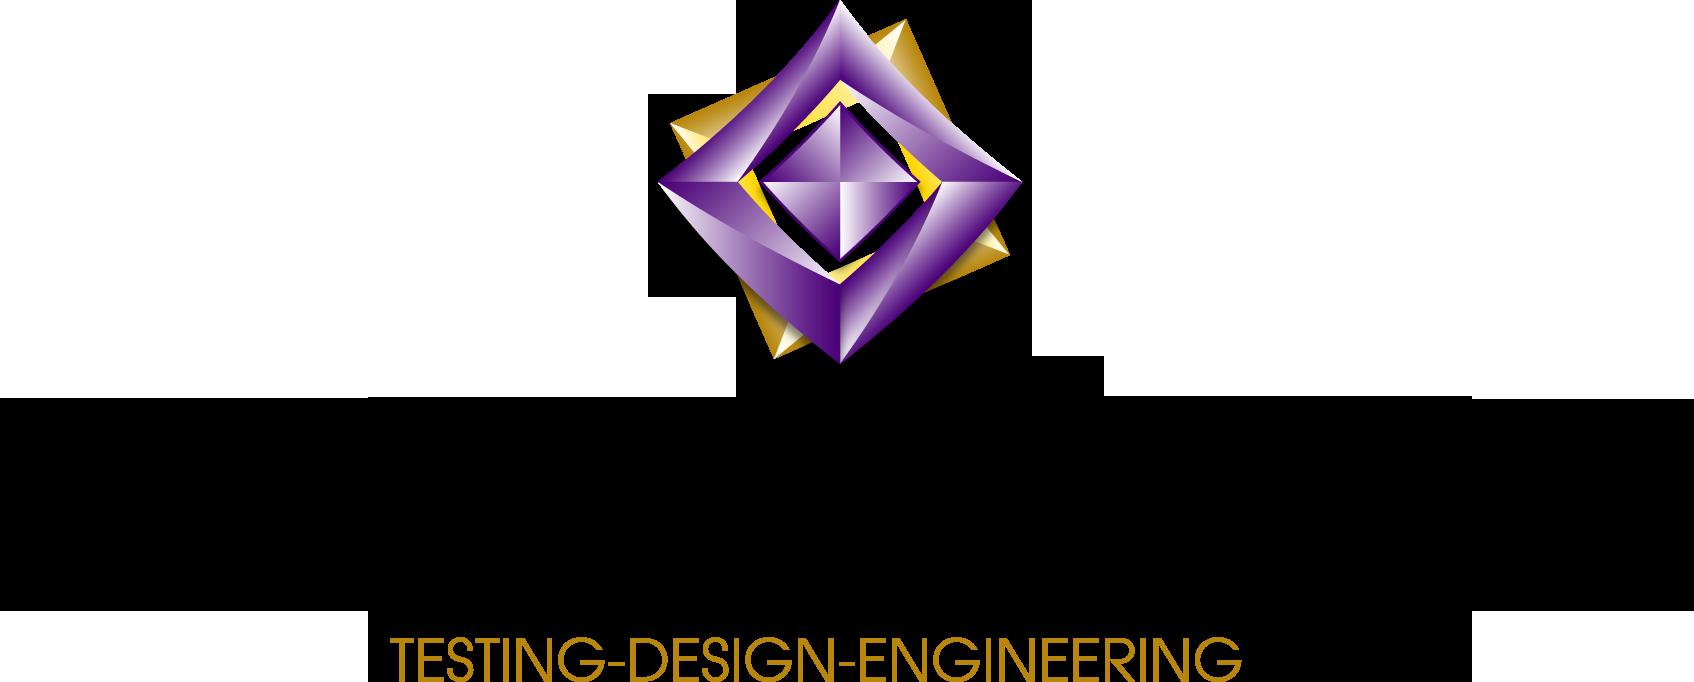 Uploaded Image: /uploads/Forum/Purple Diamond Vertical Black.png